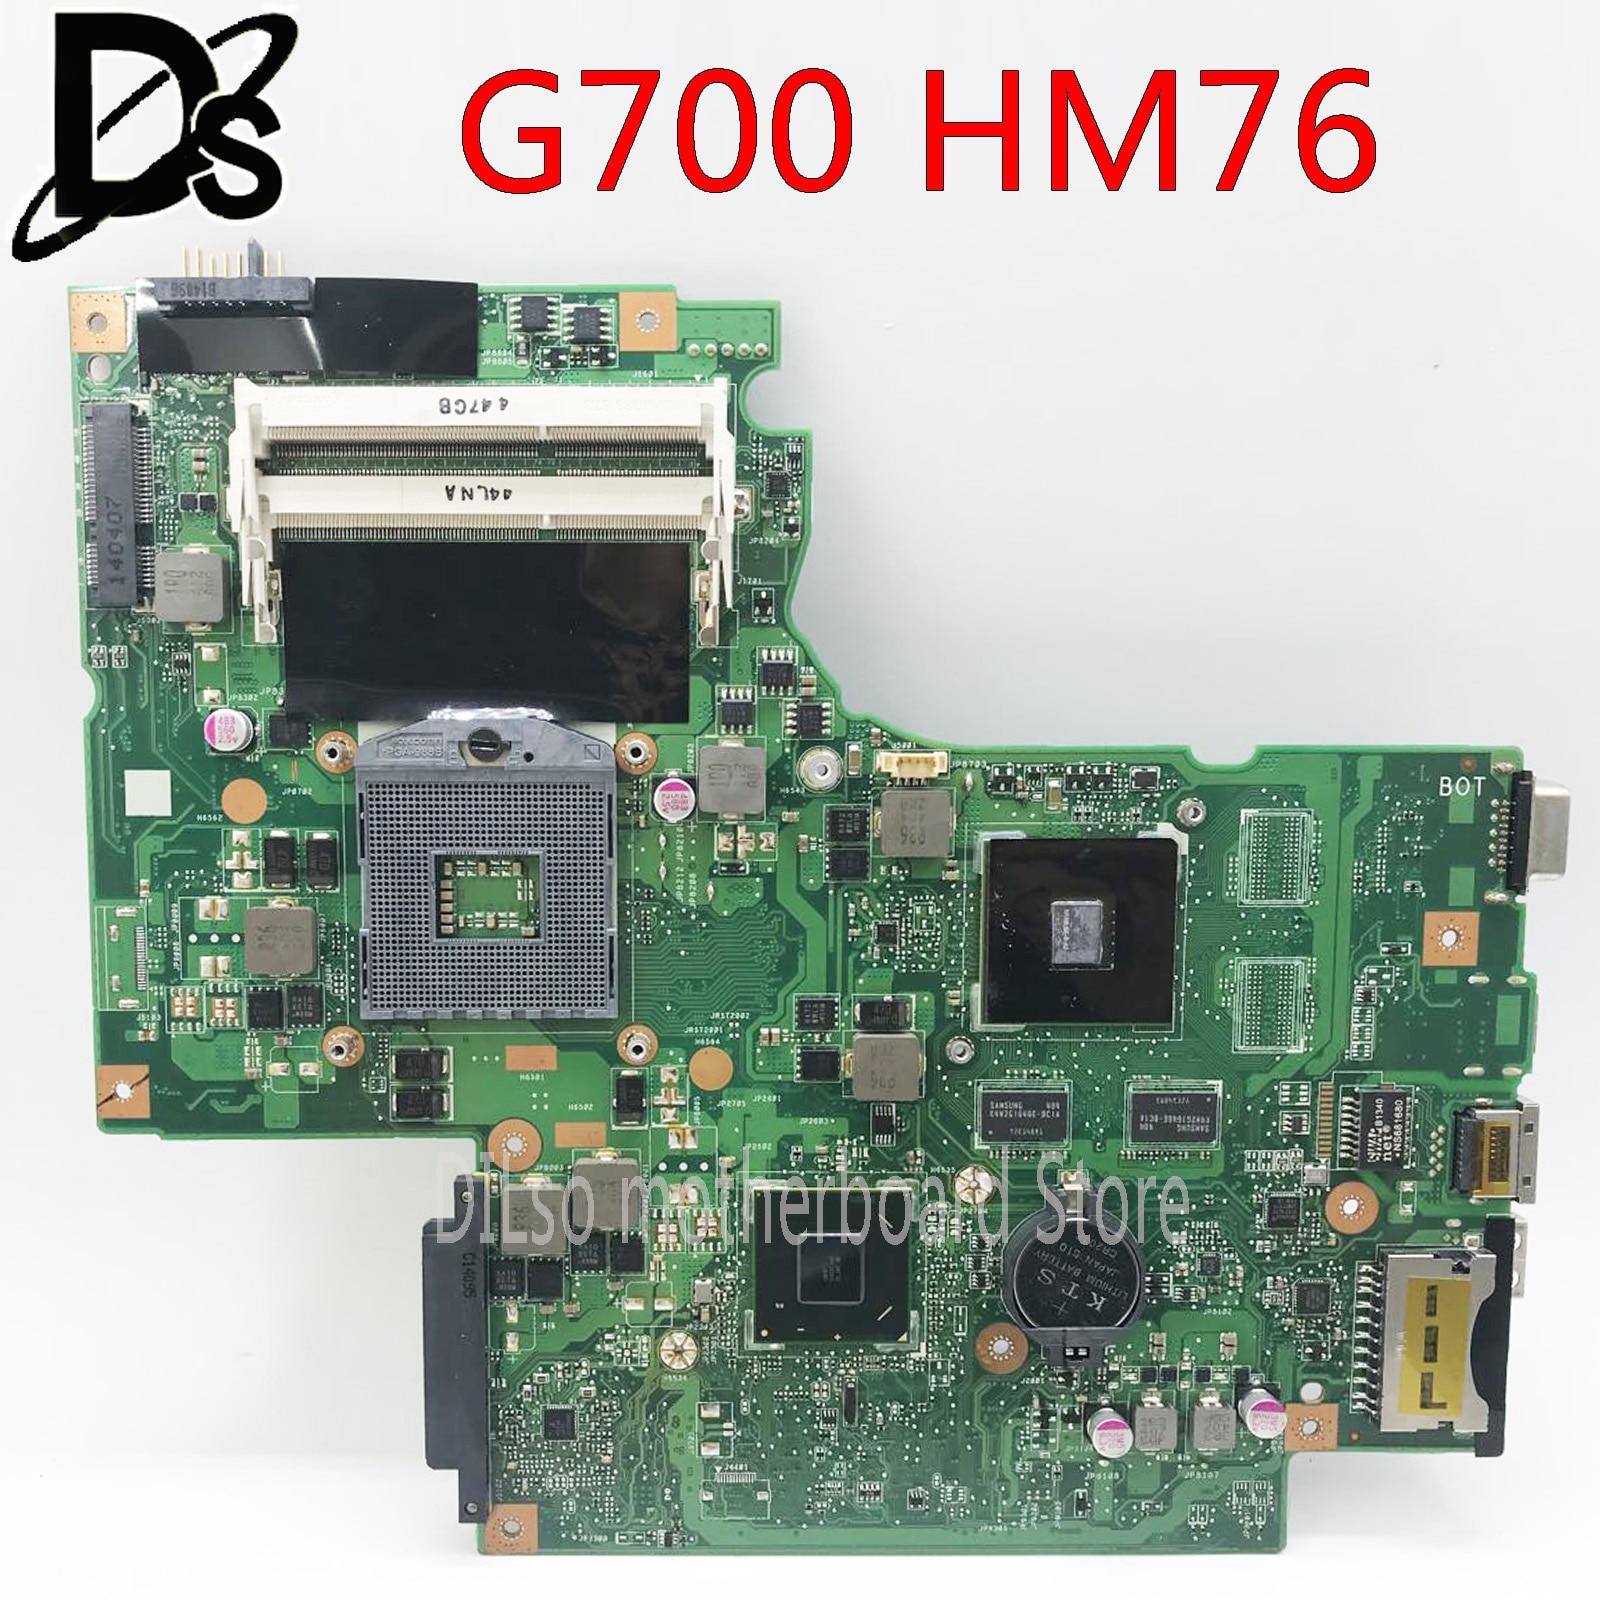 KEFU G700 Motherboard For Lenovo G700 Laptop Motherboard BAMBI Mainboard With GPU 11SN0B5M11 11S90003042 Original Mainboard